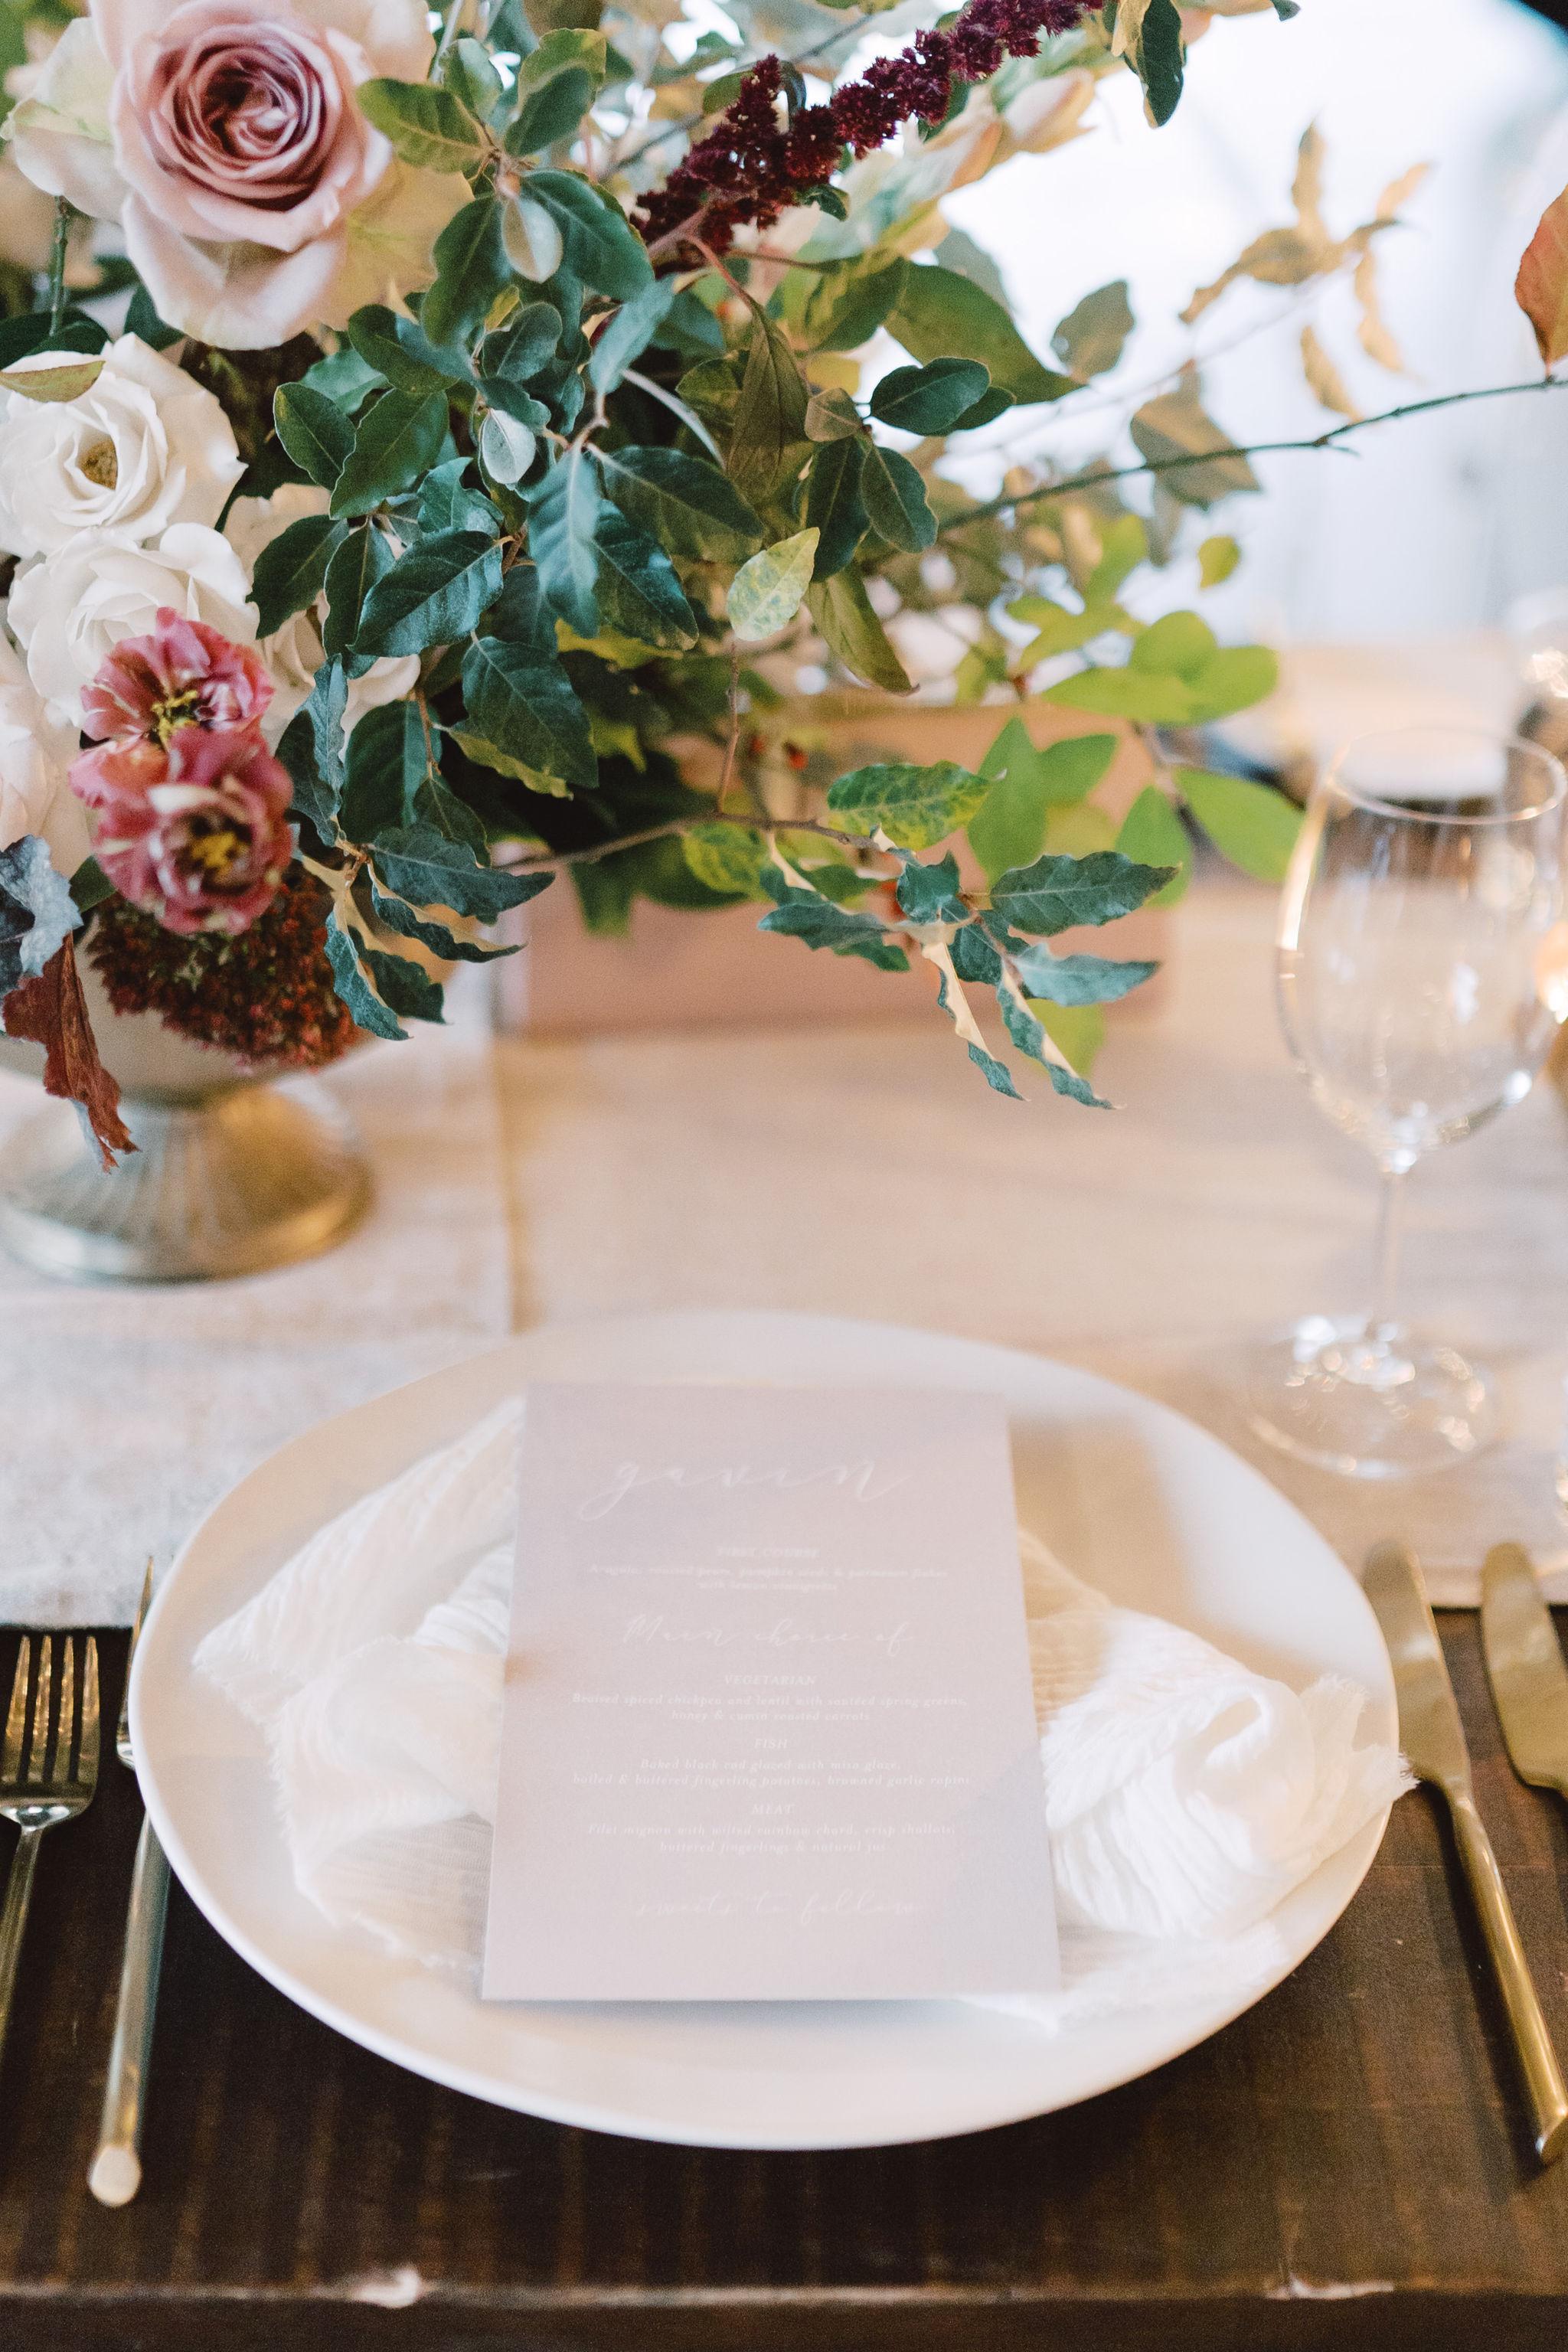 1404-artiese-evergreen-brickworks-wedding-ashleycraig-03960.jpg